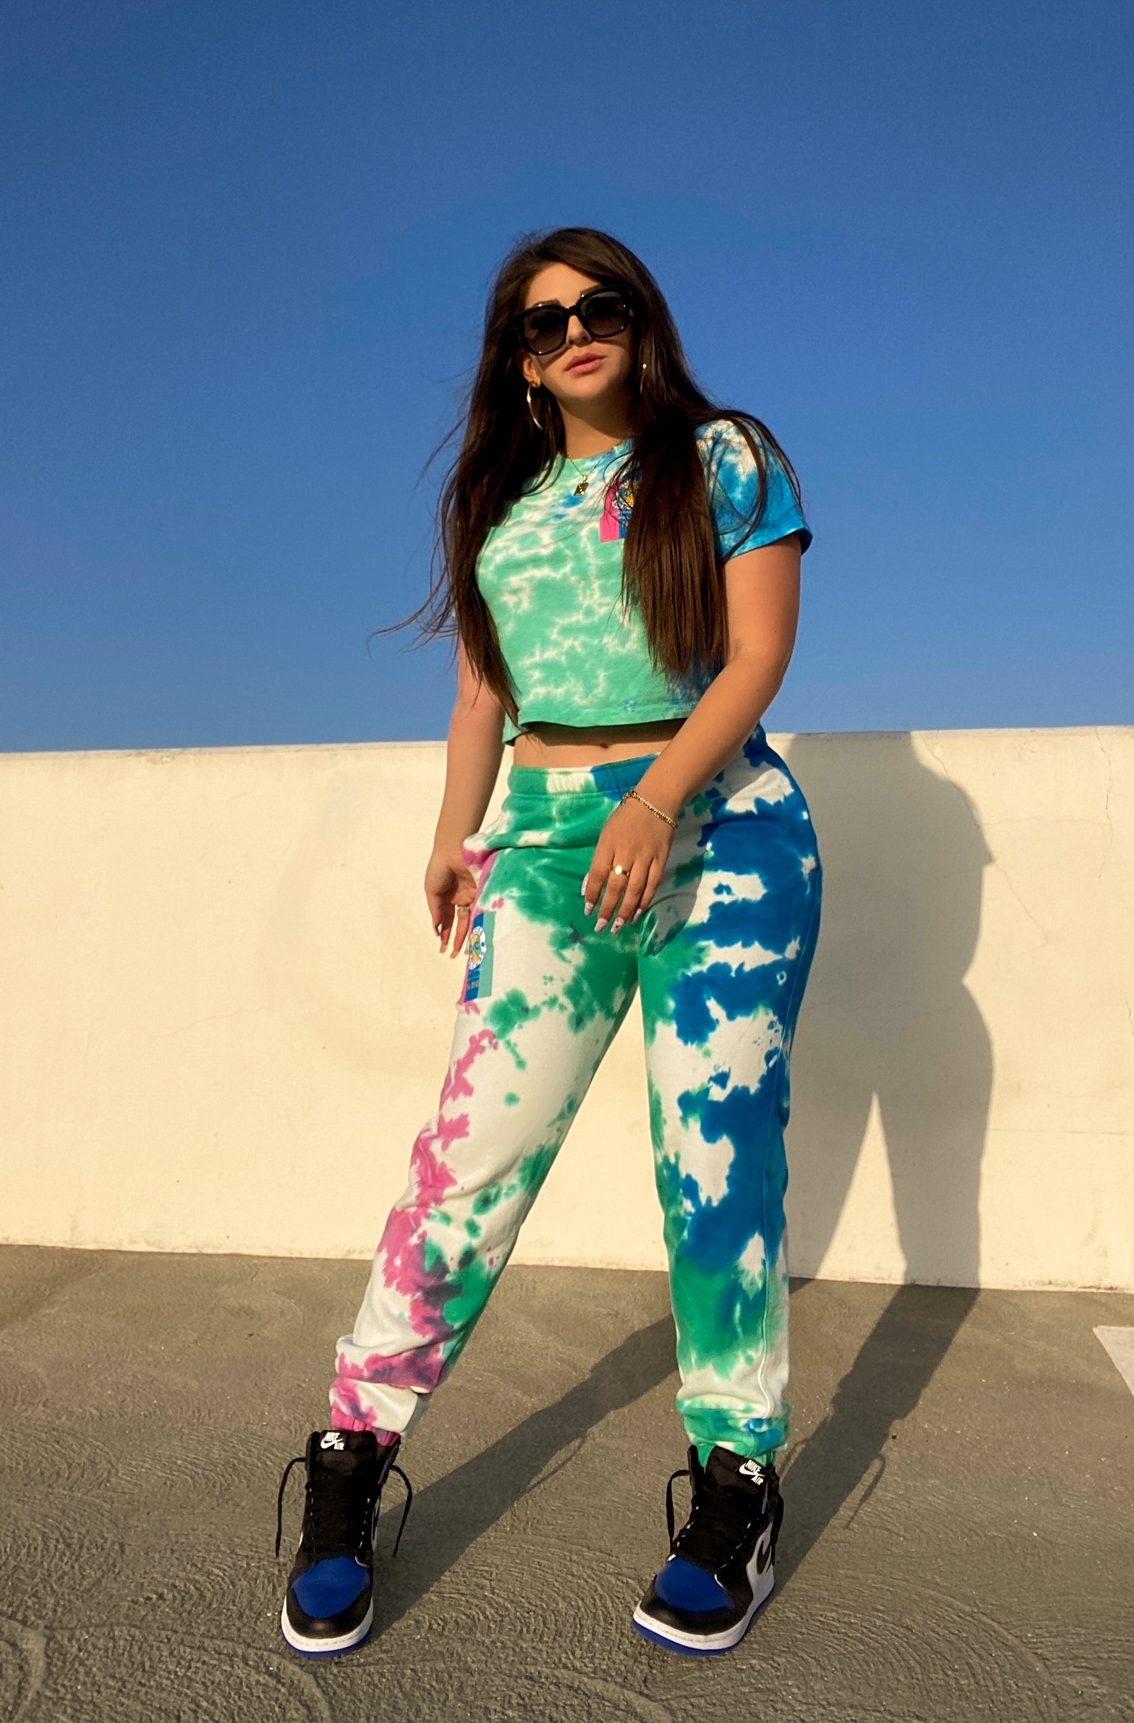 tie-dye streetwear - Beyond Casual B - Bianca Cortez